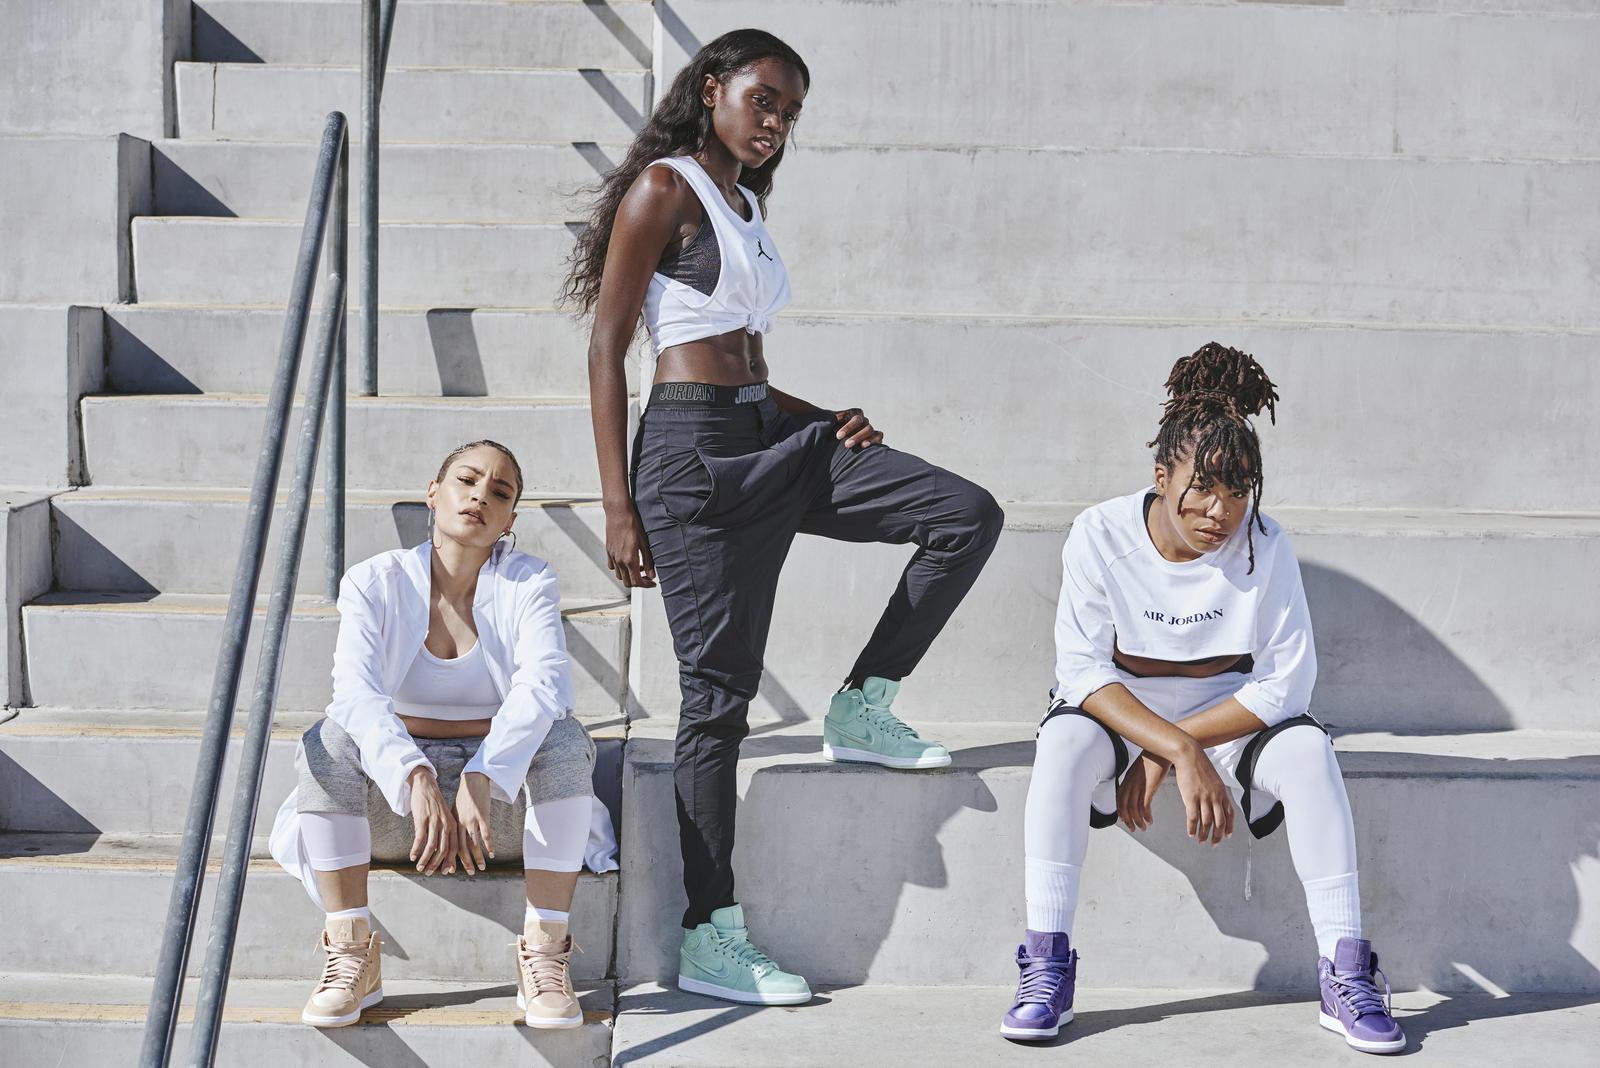 Jordan Brand Reveals Spring 2018 Womens Collection Nike